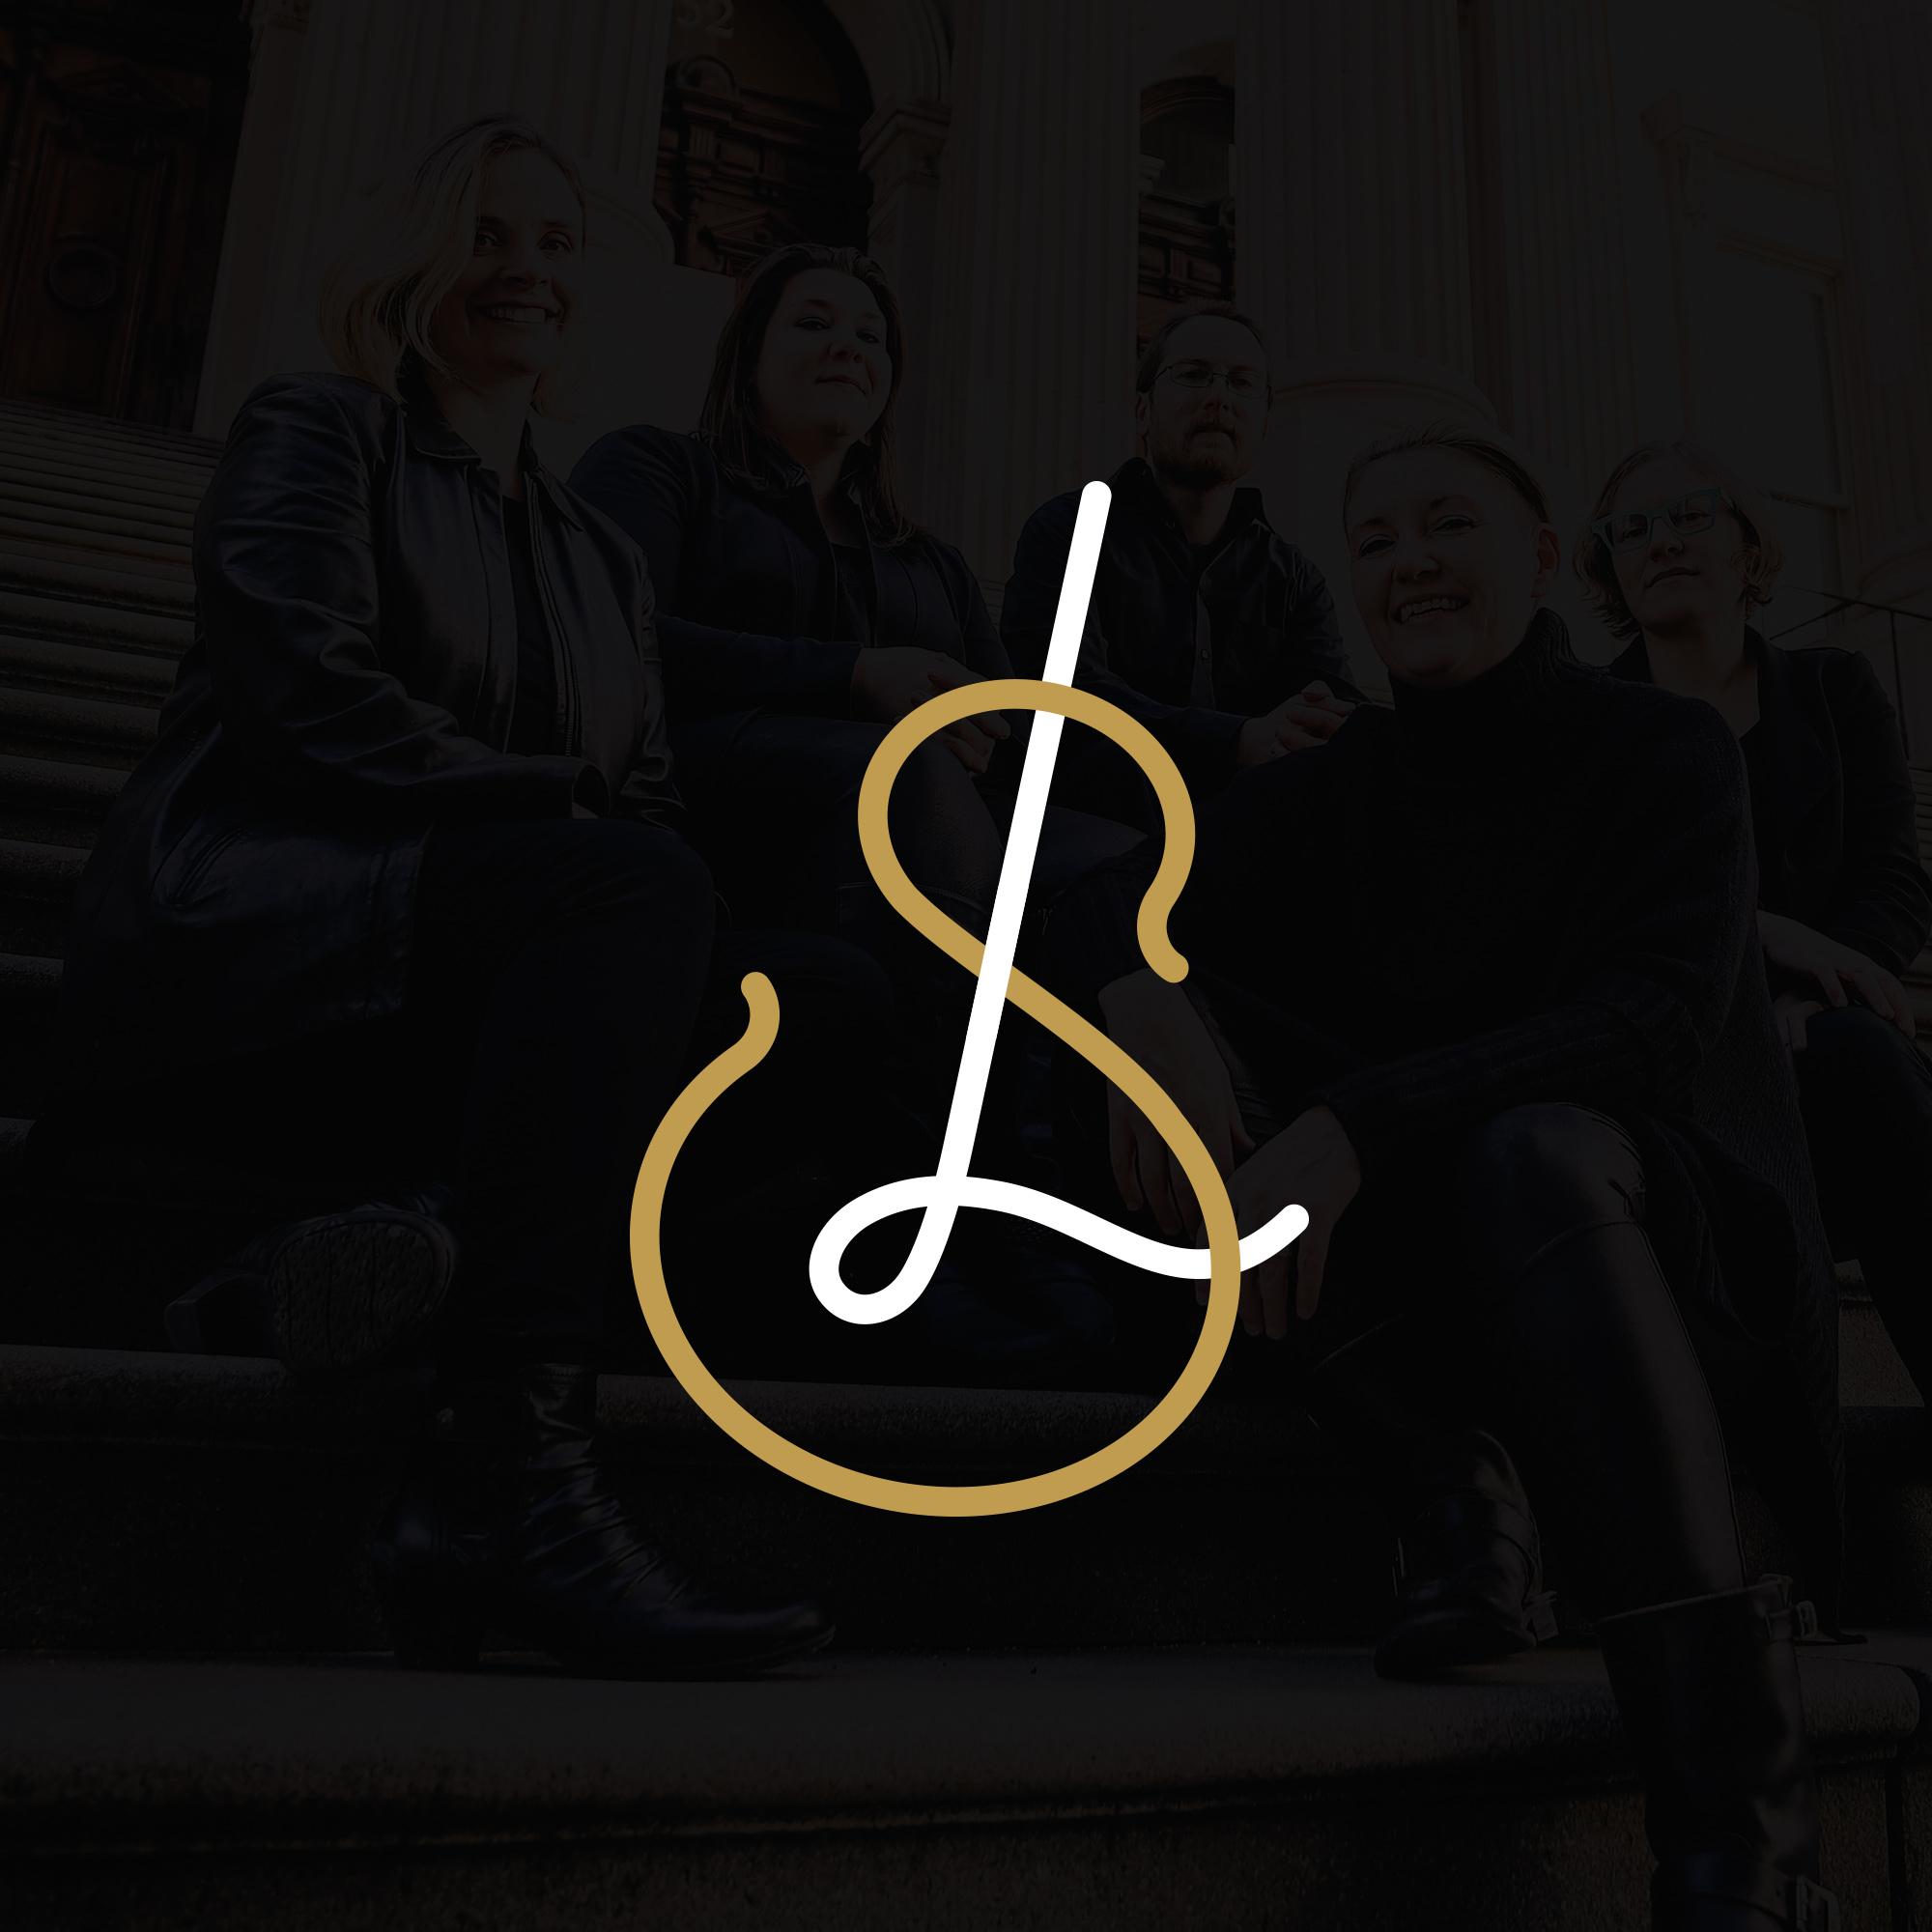 W.A. Mozart - Ave Verum Corpus from K. 618Eine Kleine Nachtmusik - String Quartet In G Major, K. 525 - Allegro, Romanza, Menuetto, Rondo Rondo alla turca from Piano Sonata in A Major, K. 331